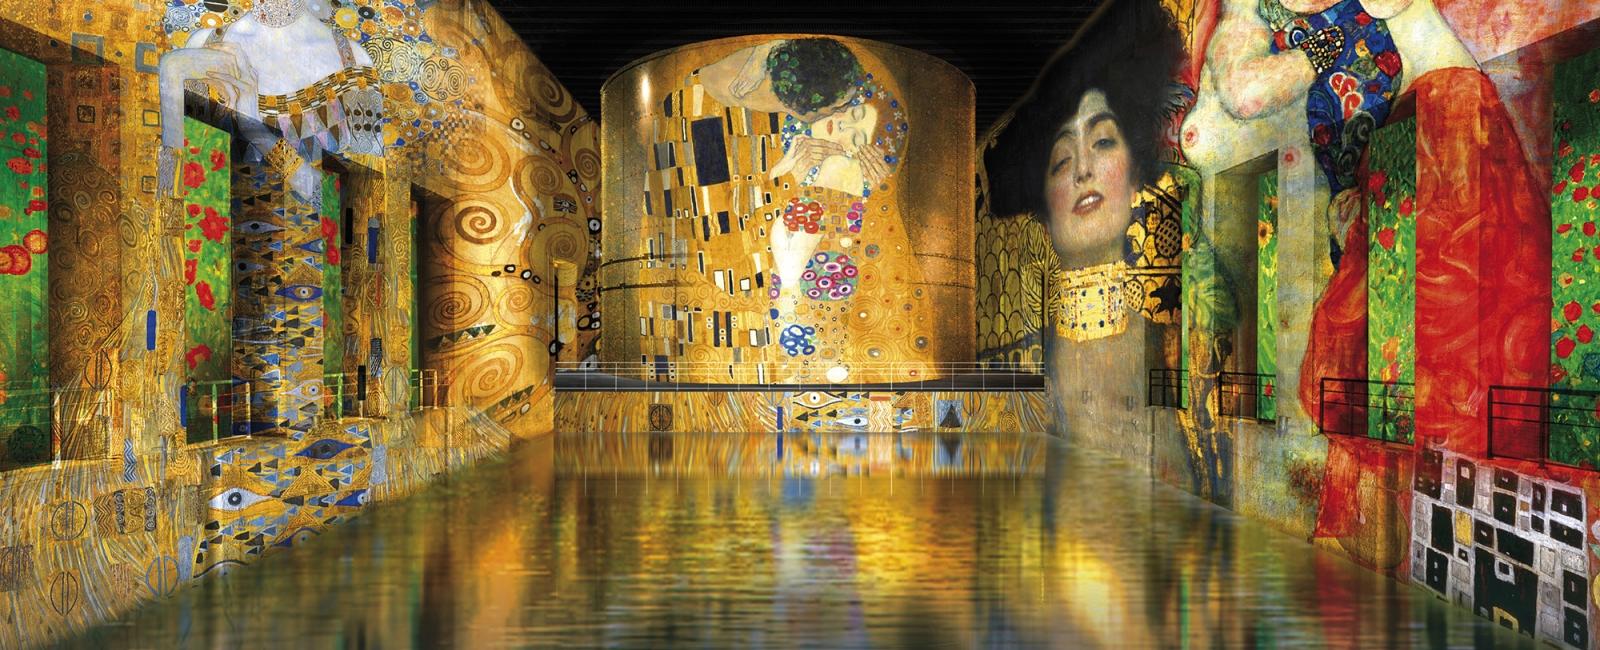 Gustav Klimt, à partir du 17/04